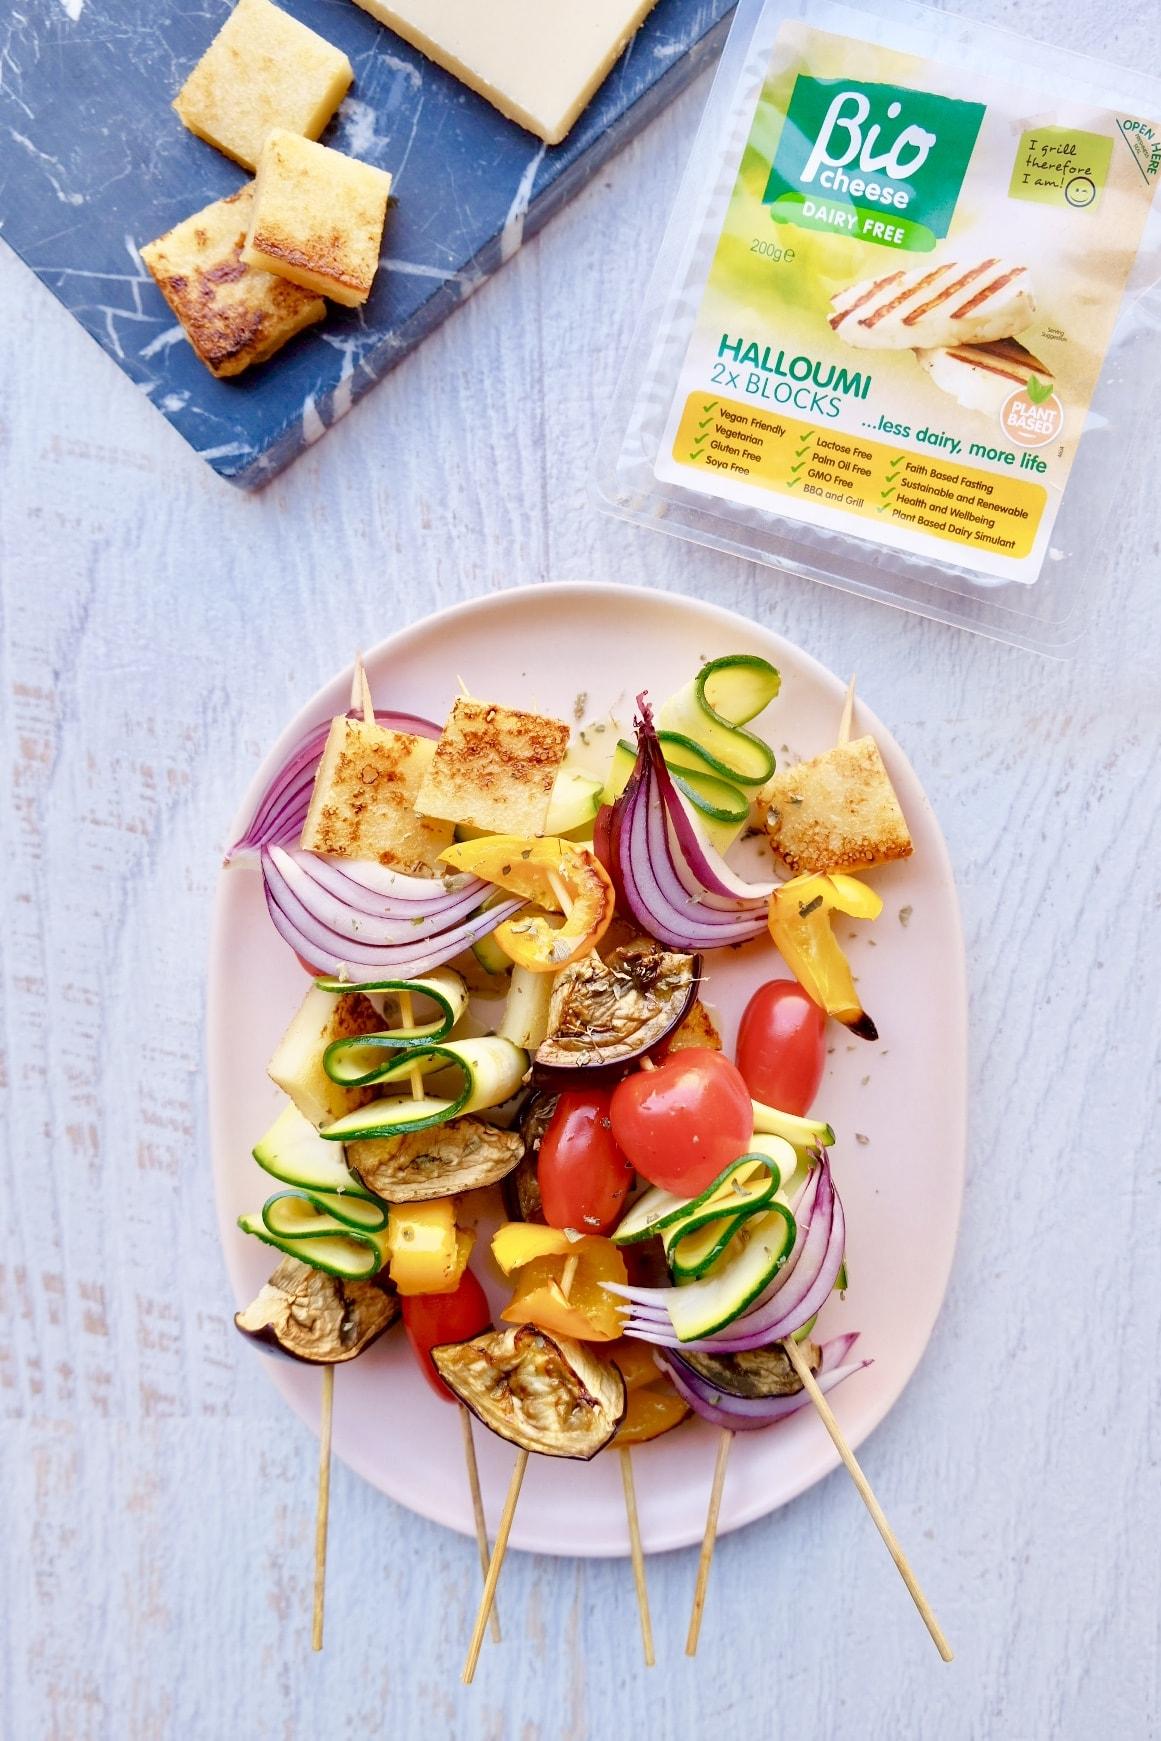 bio cheese plant based halloumi